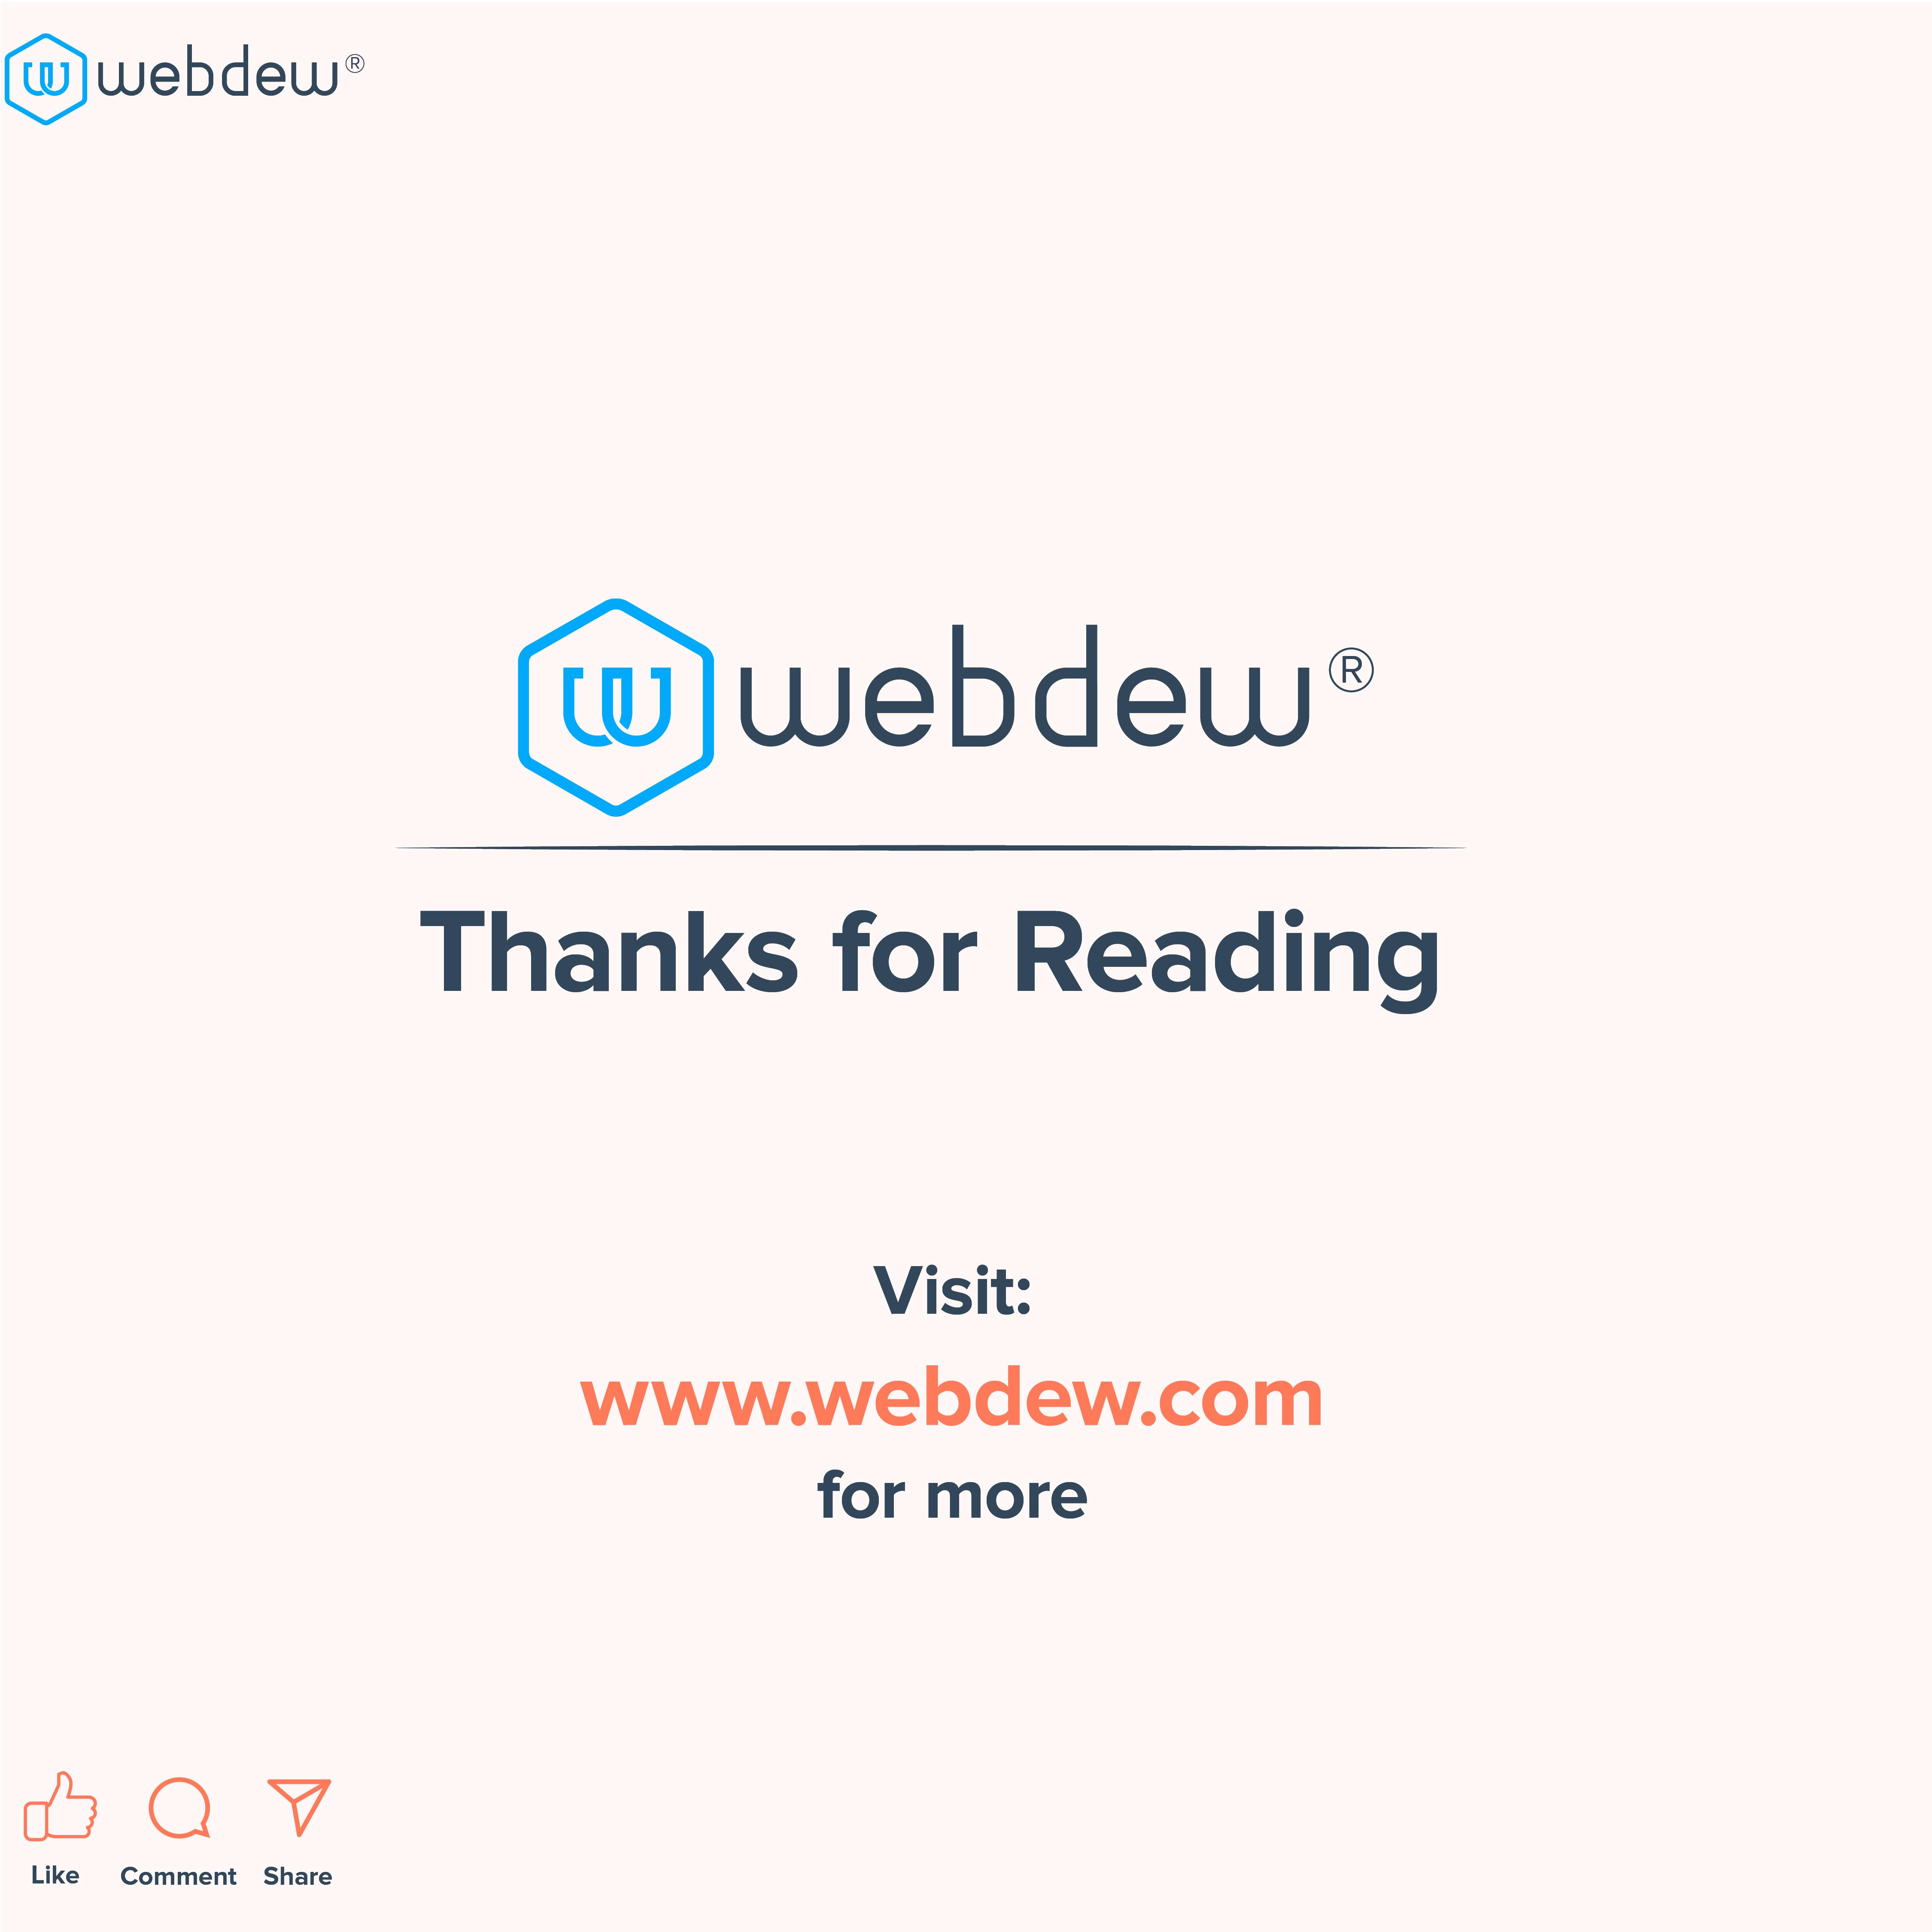 6. thanks for reading-1